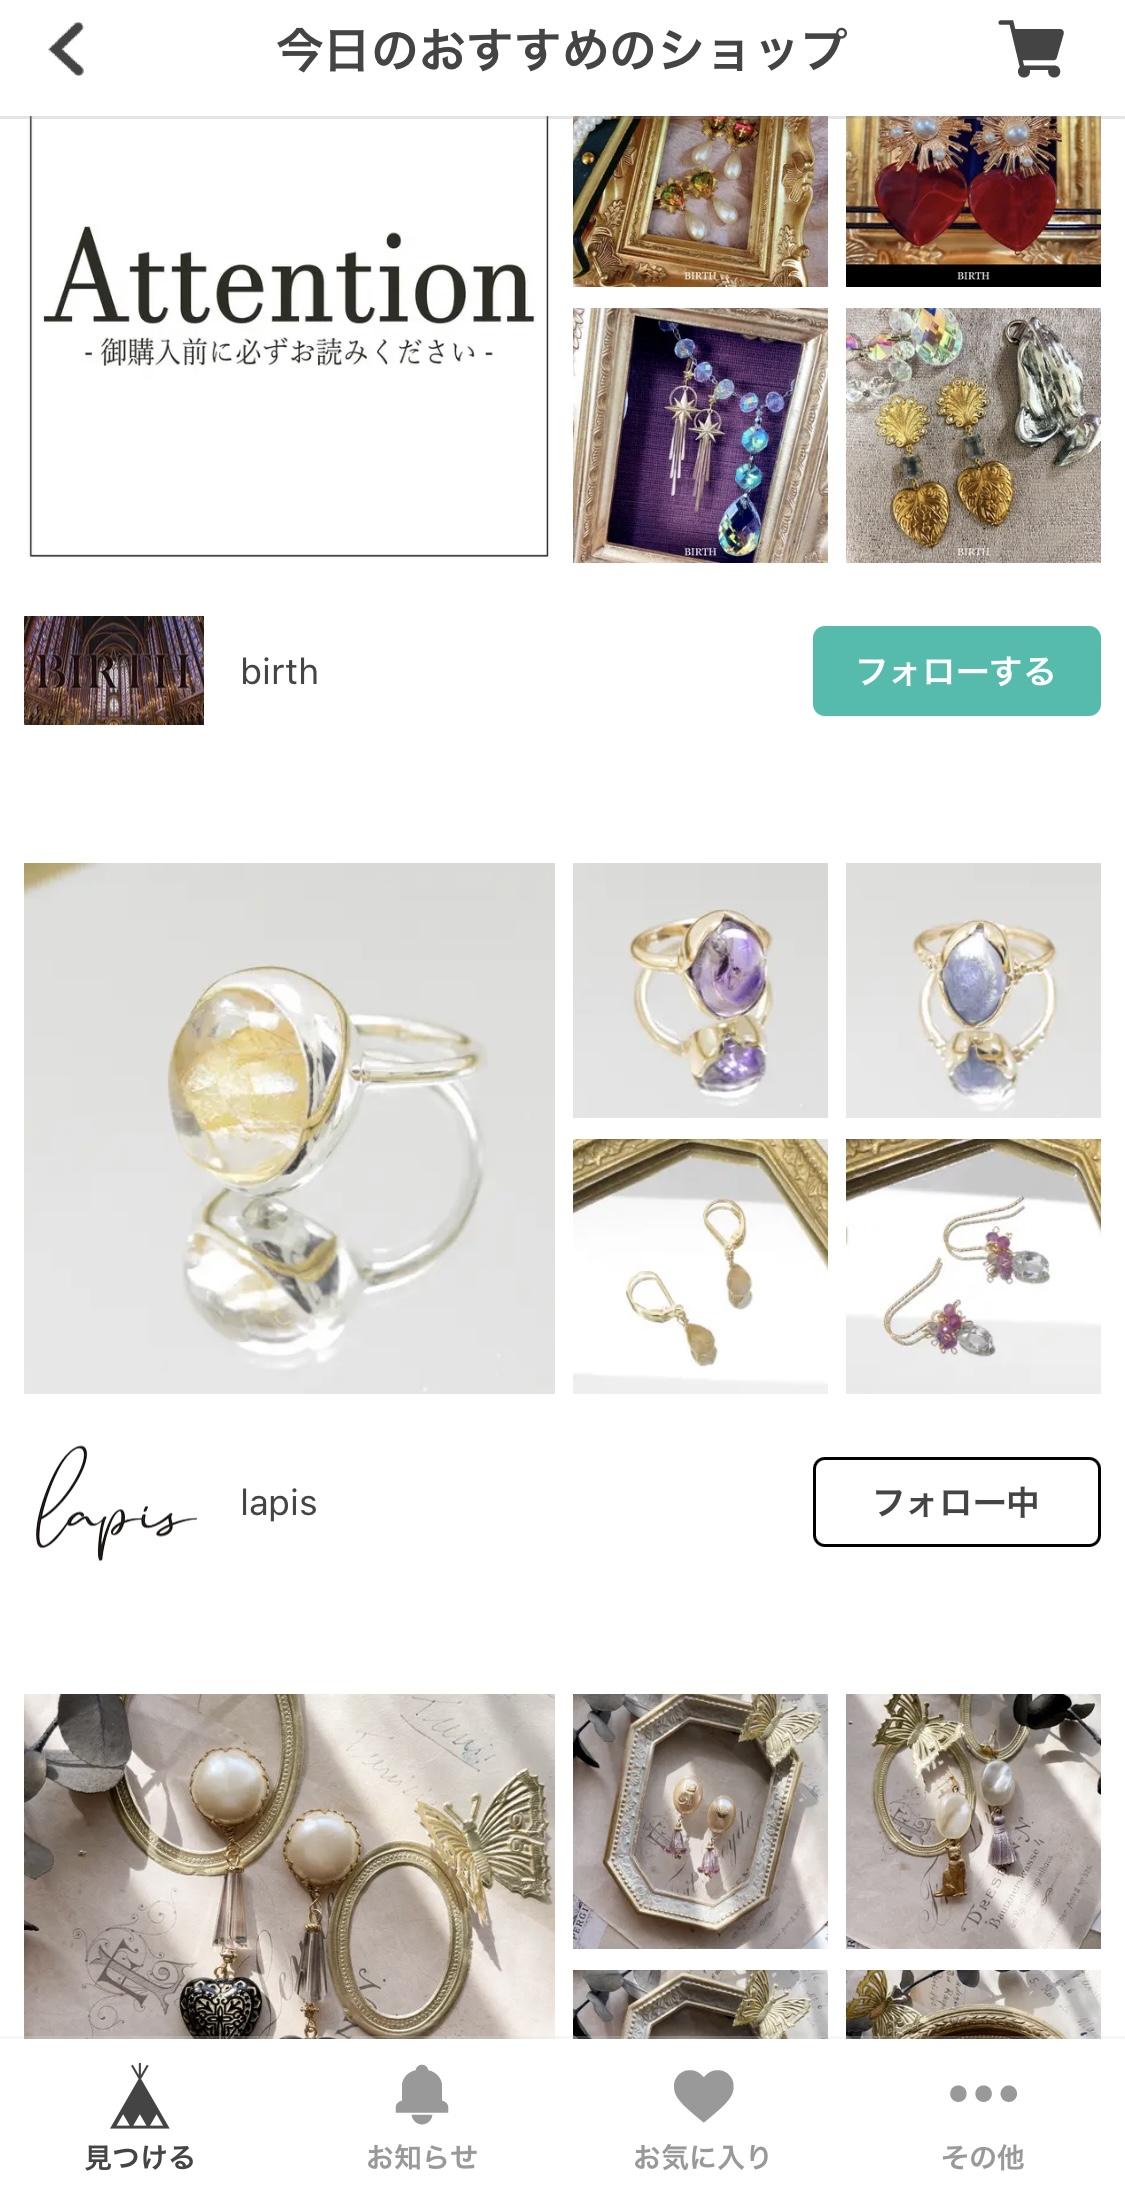 BASEアプリ『今日のおすすめショップ』掲載